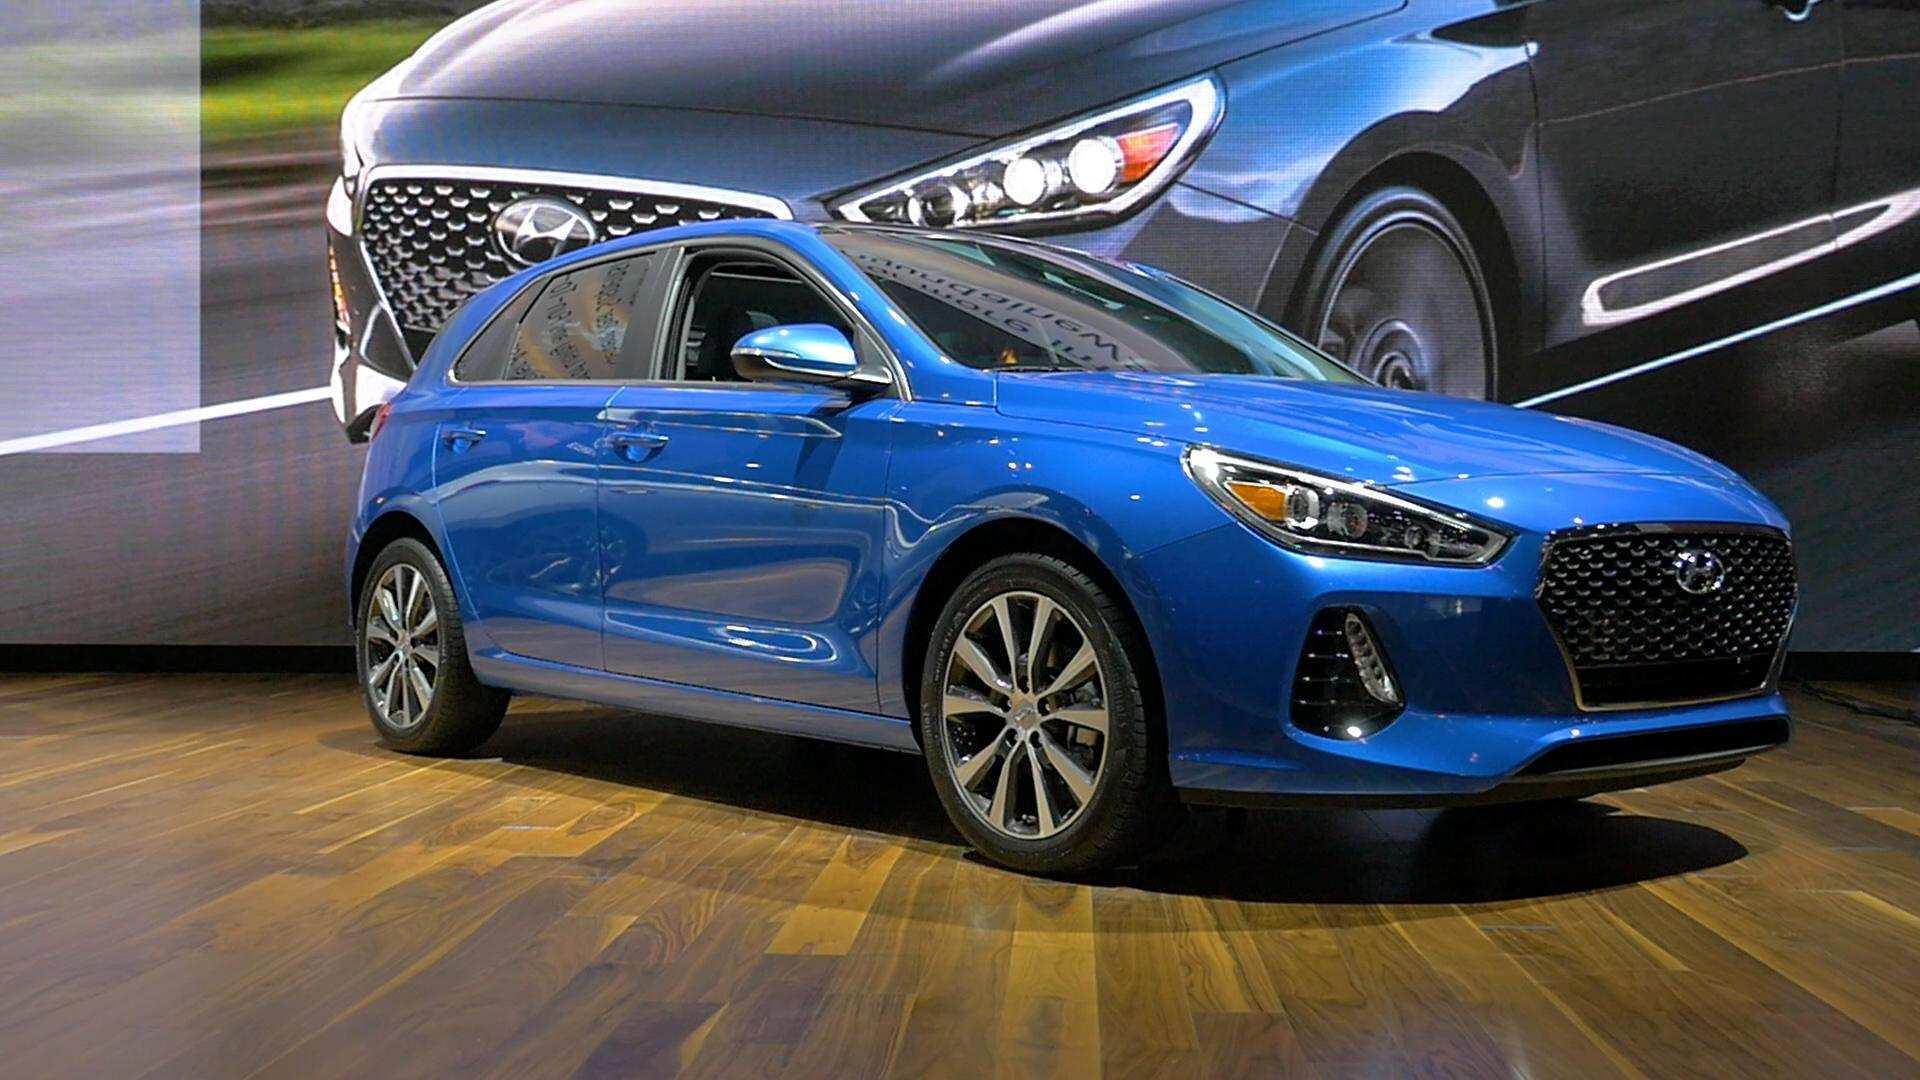 84 The 2020 Hyundai Elantra Gt Specs And Review For 2020